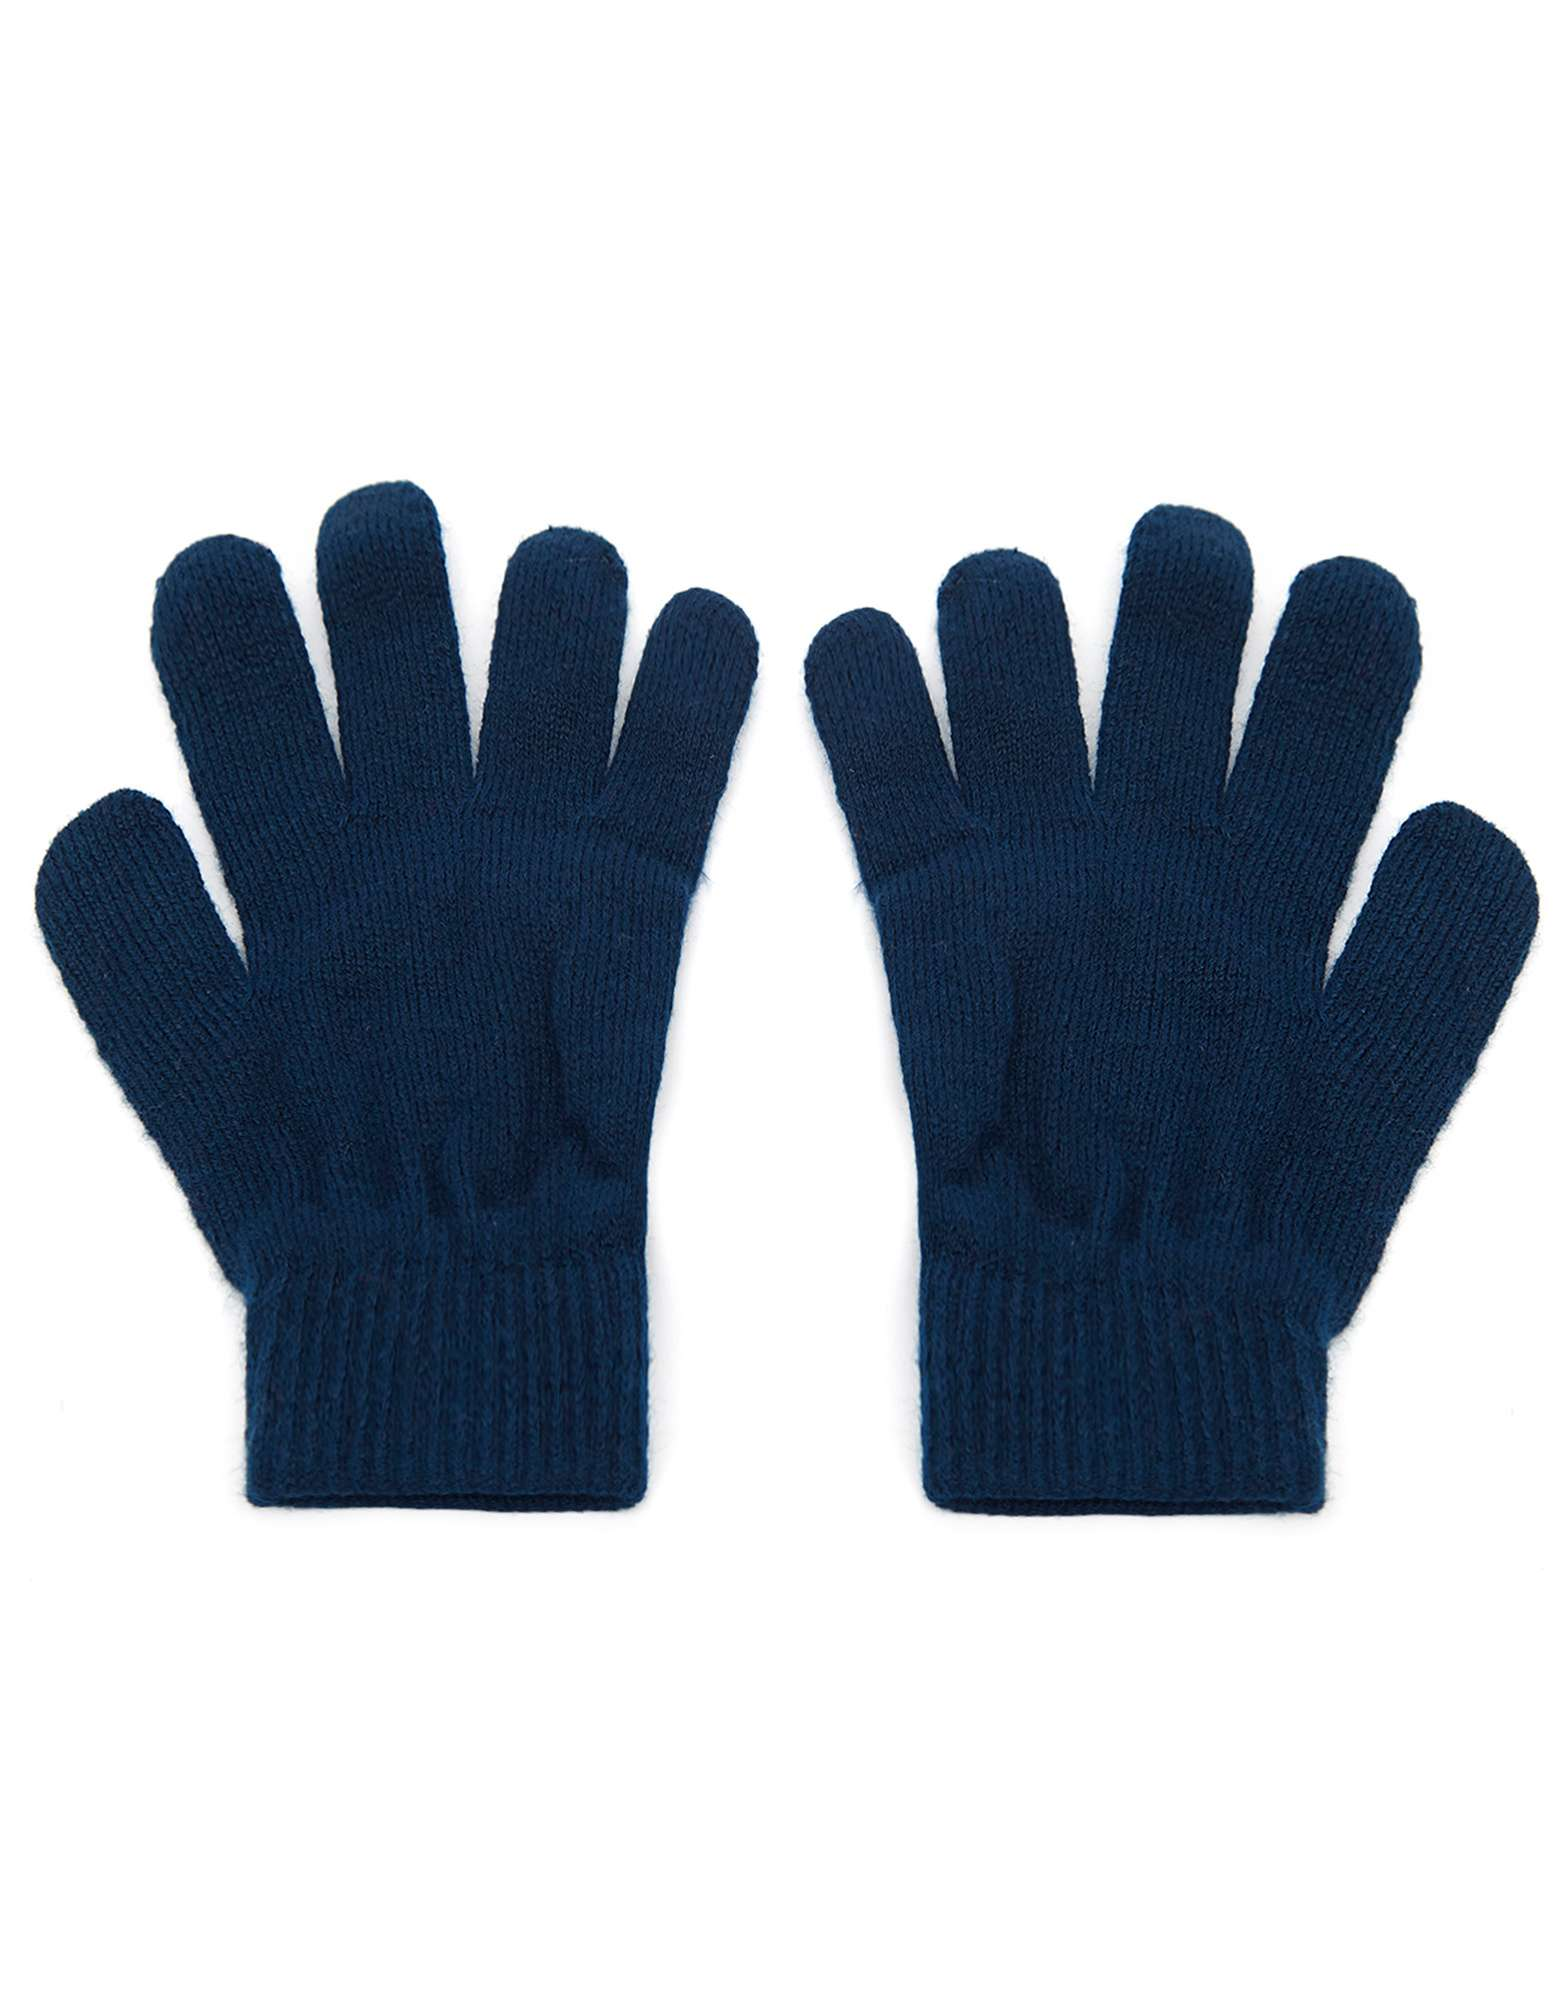 Official Team Chelsea FC Gloves